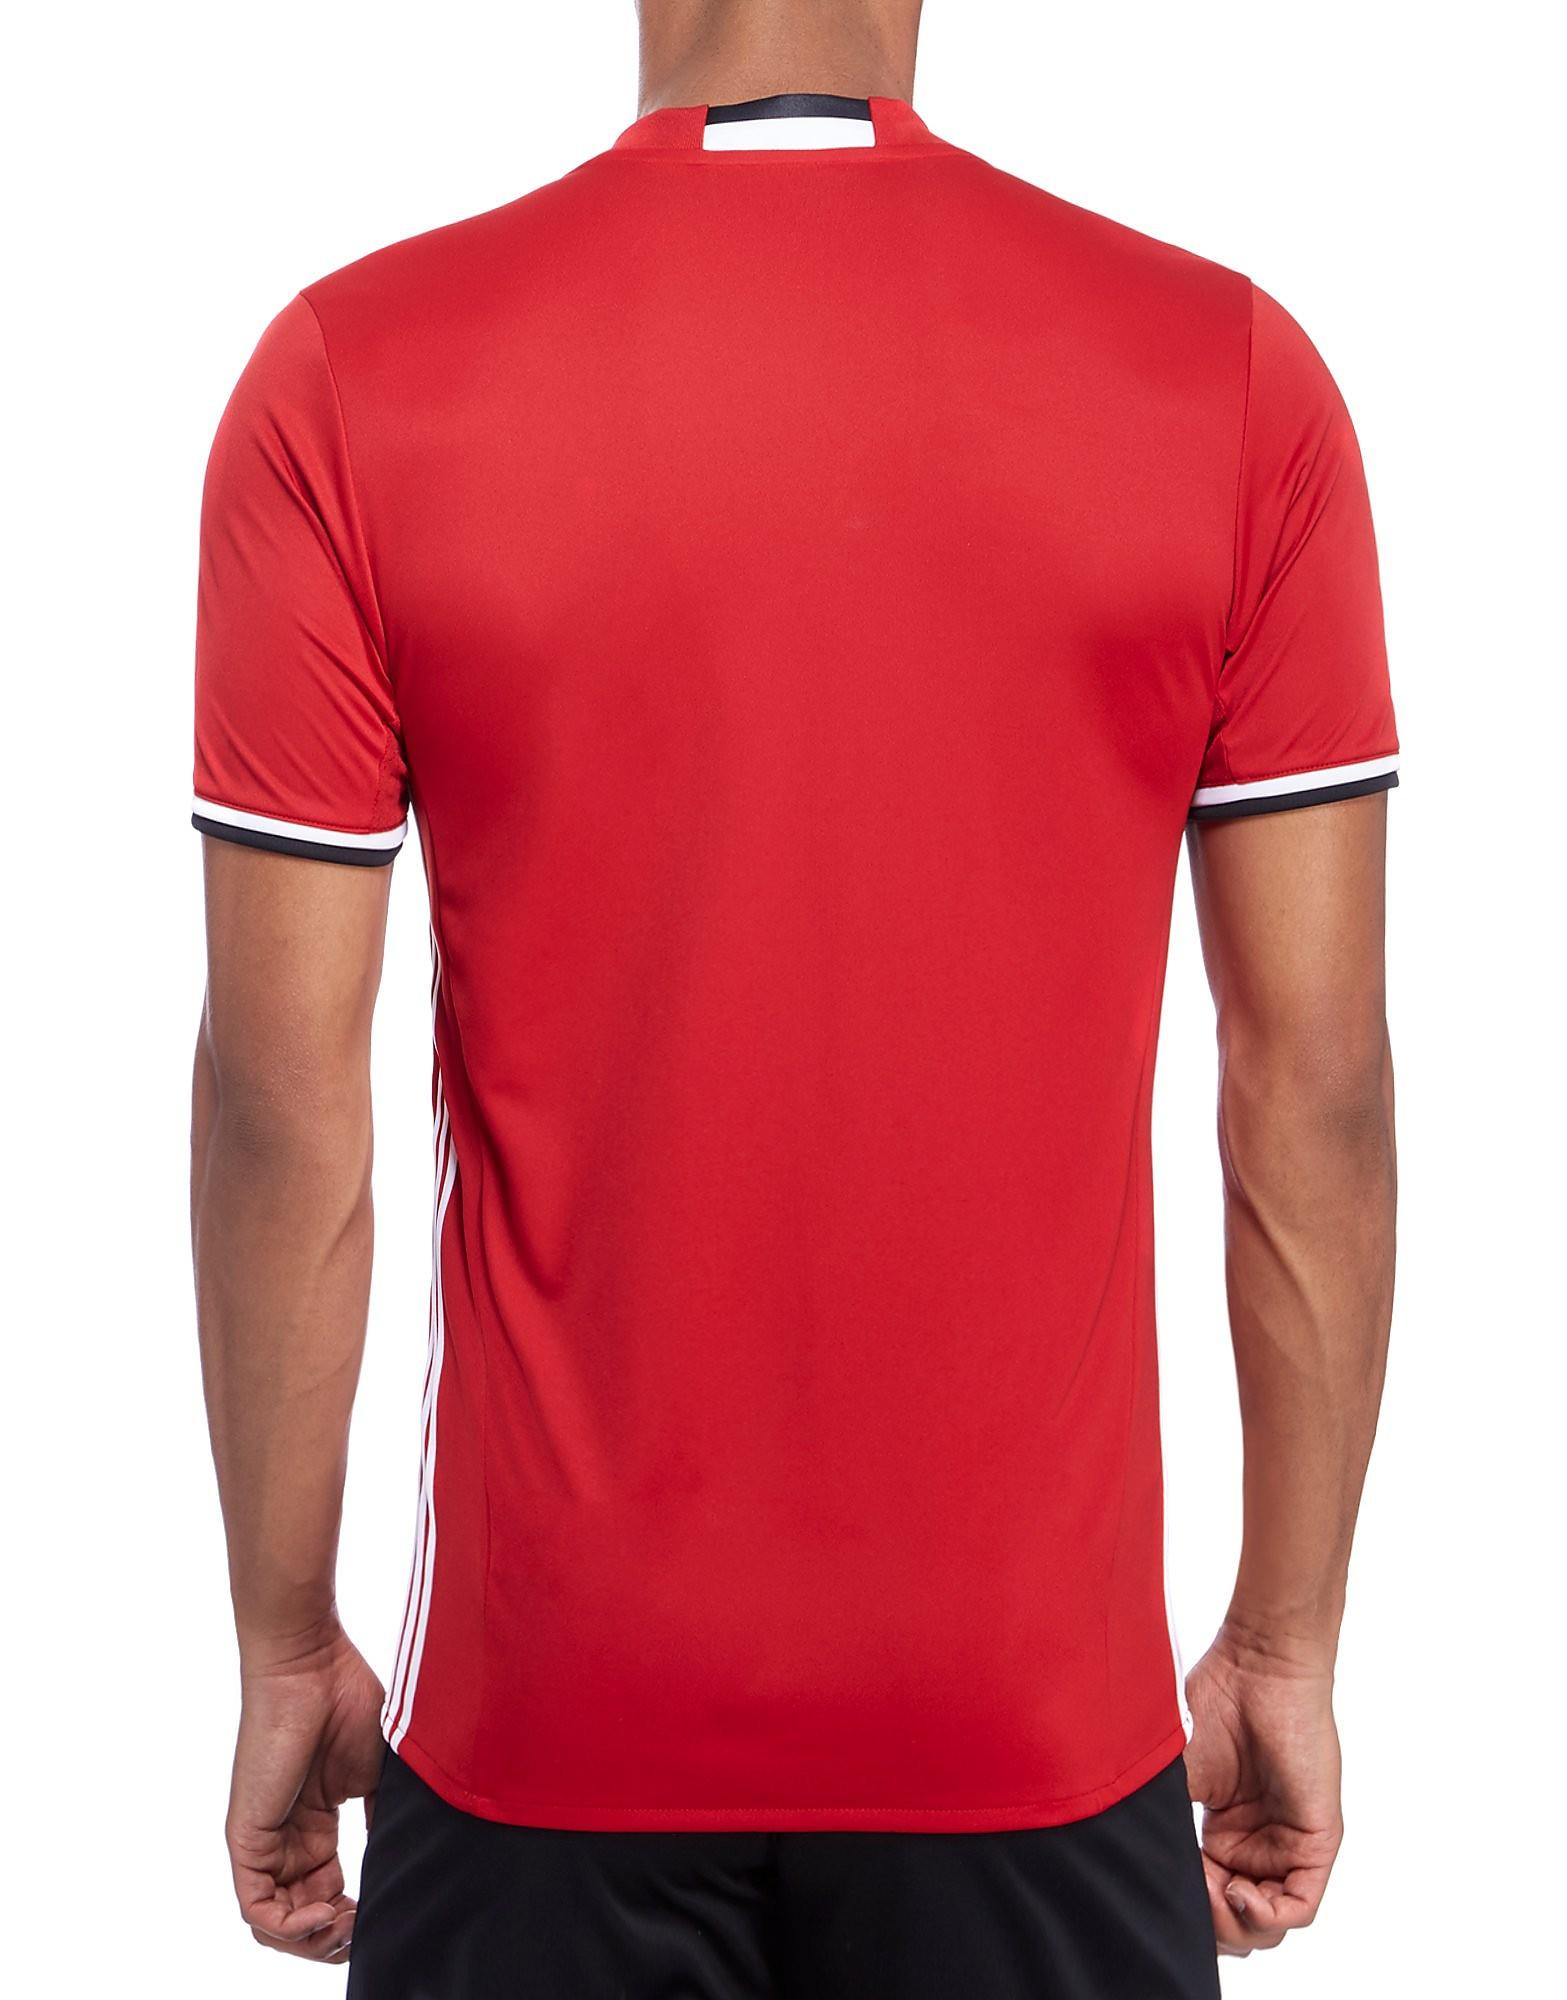 adidas Cardiff City FC 2016/17 Away Shirt